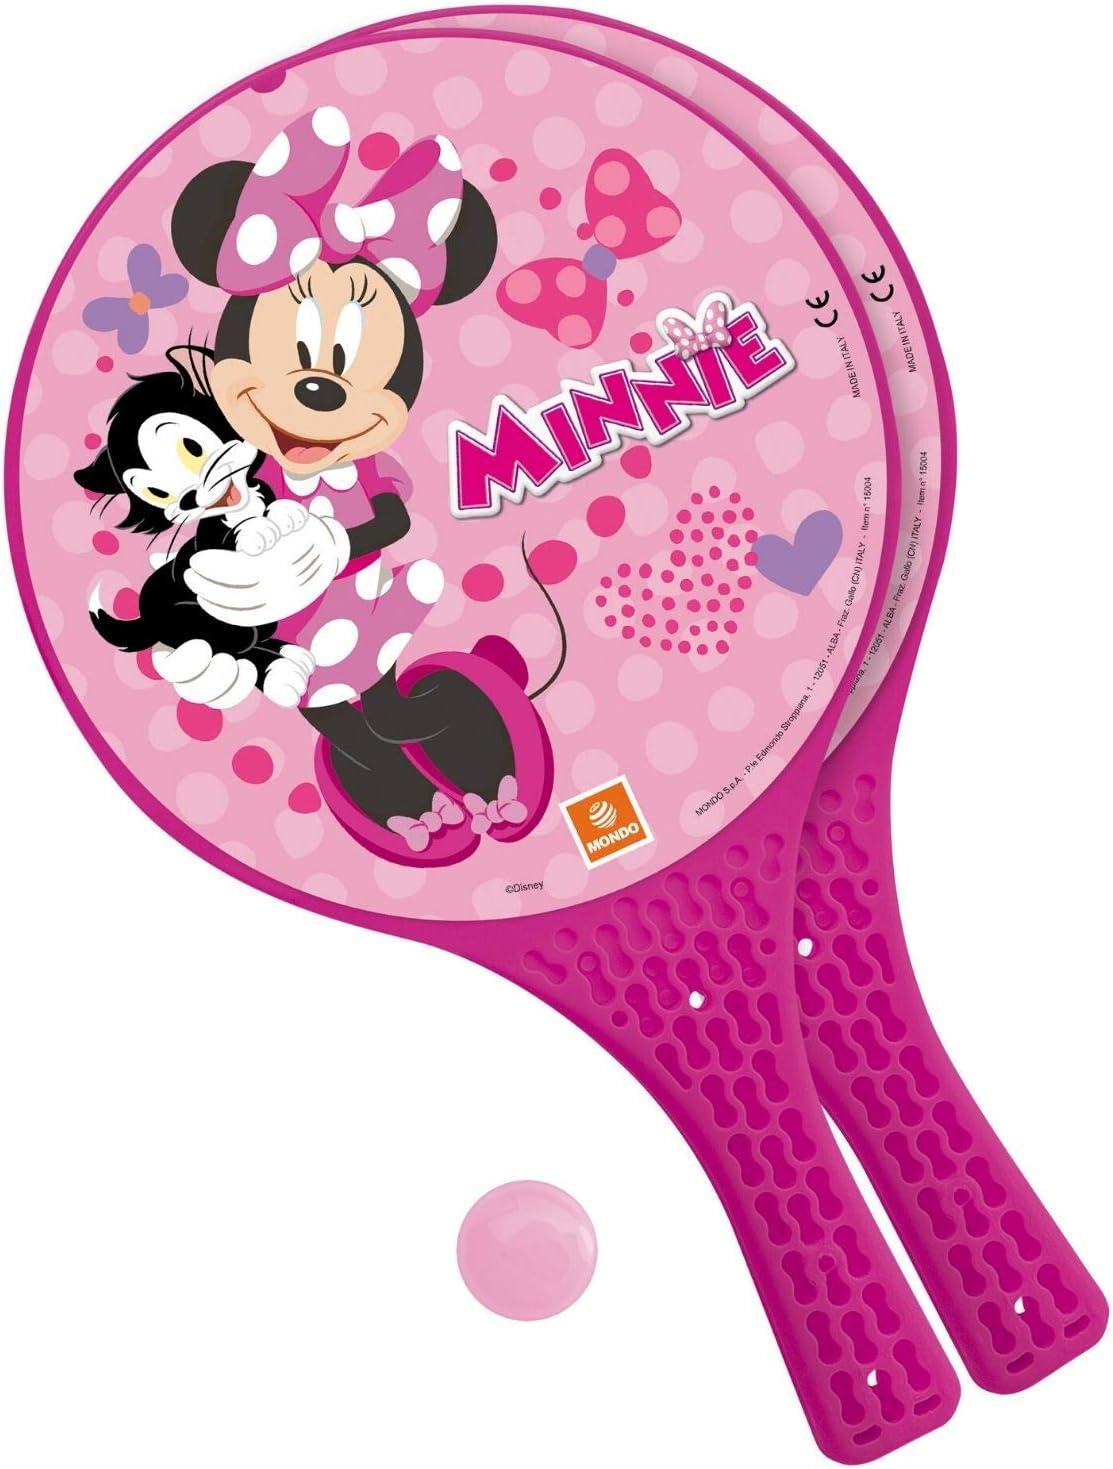 Minnie Mouse - Set palas de playa, 22 cm (Mondo 15004): Amazon.es ...